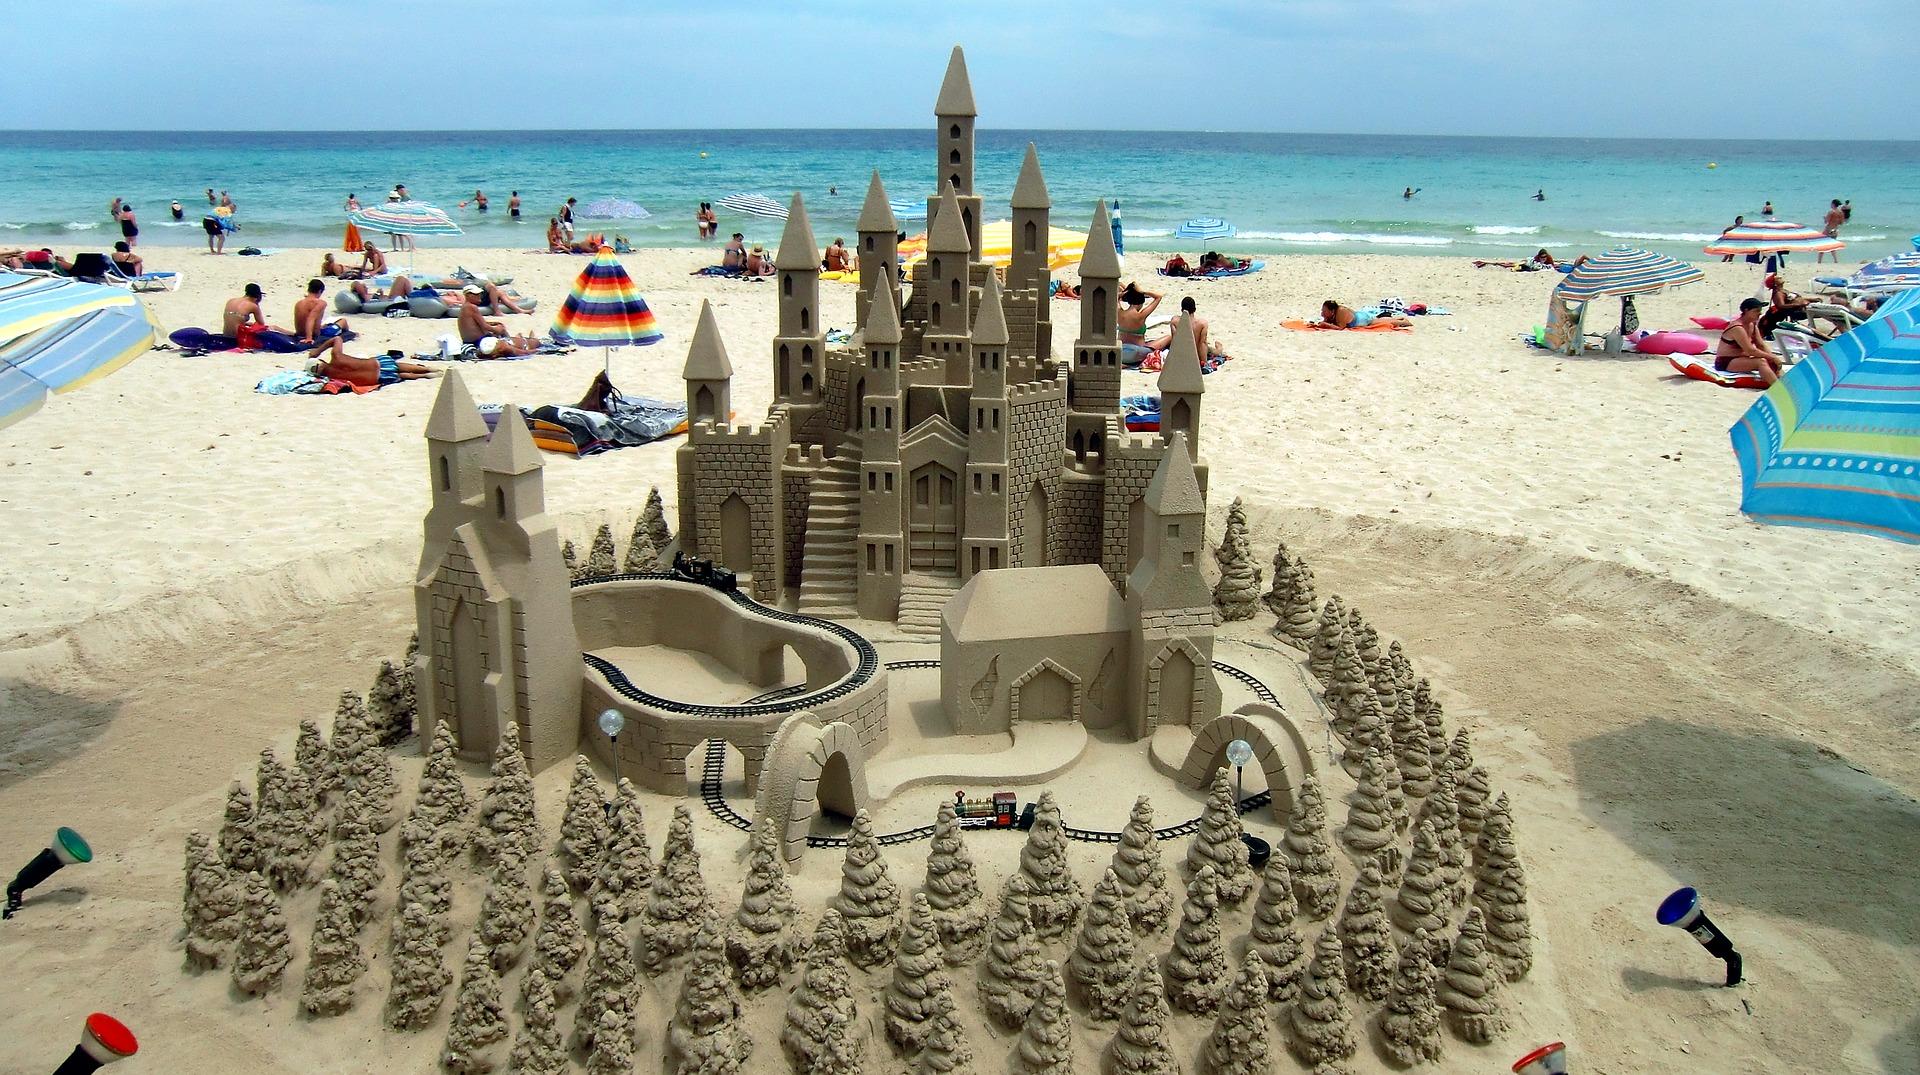 Besøg strandene på Mallorca med børnene